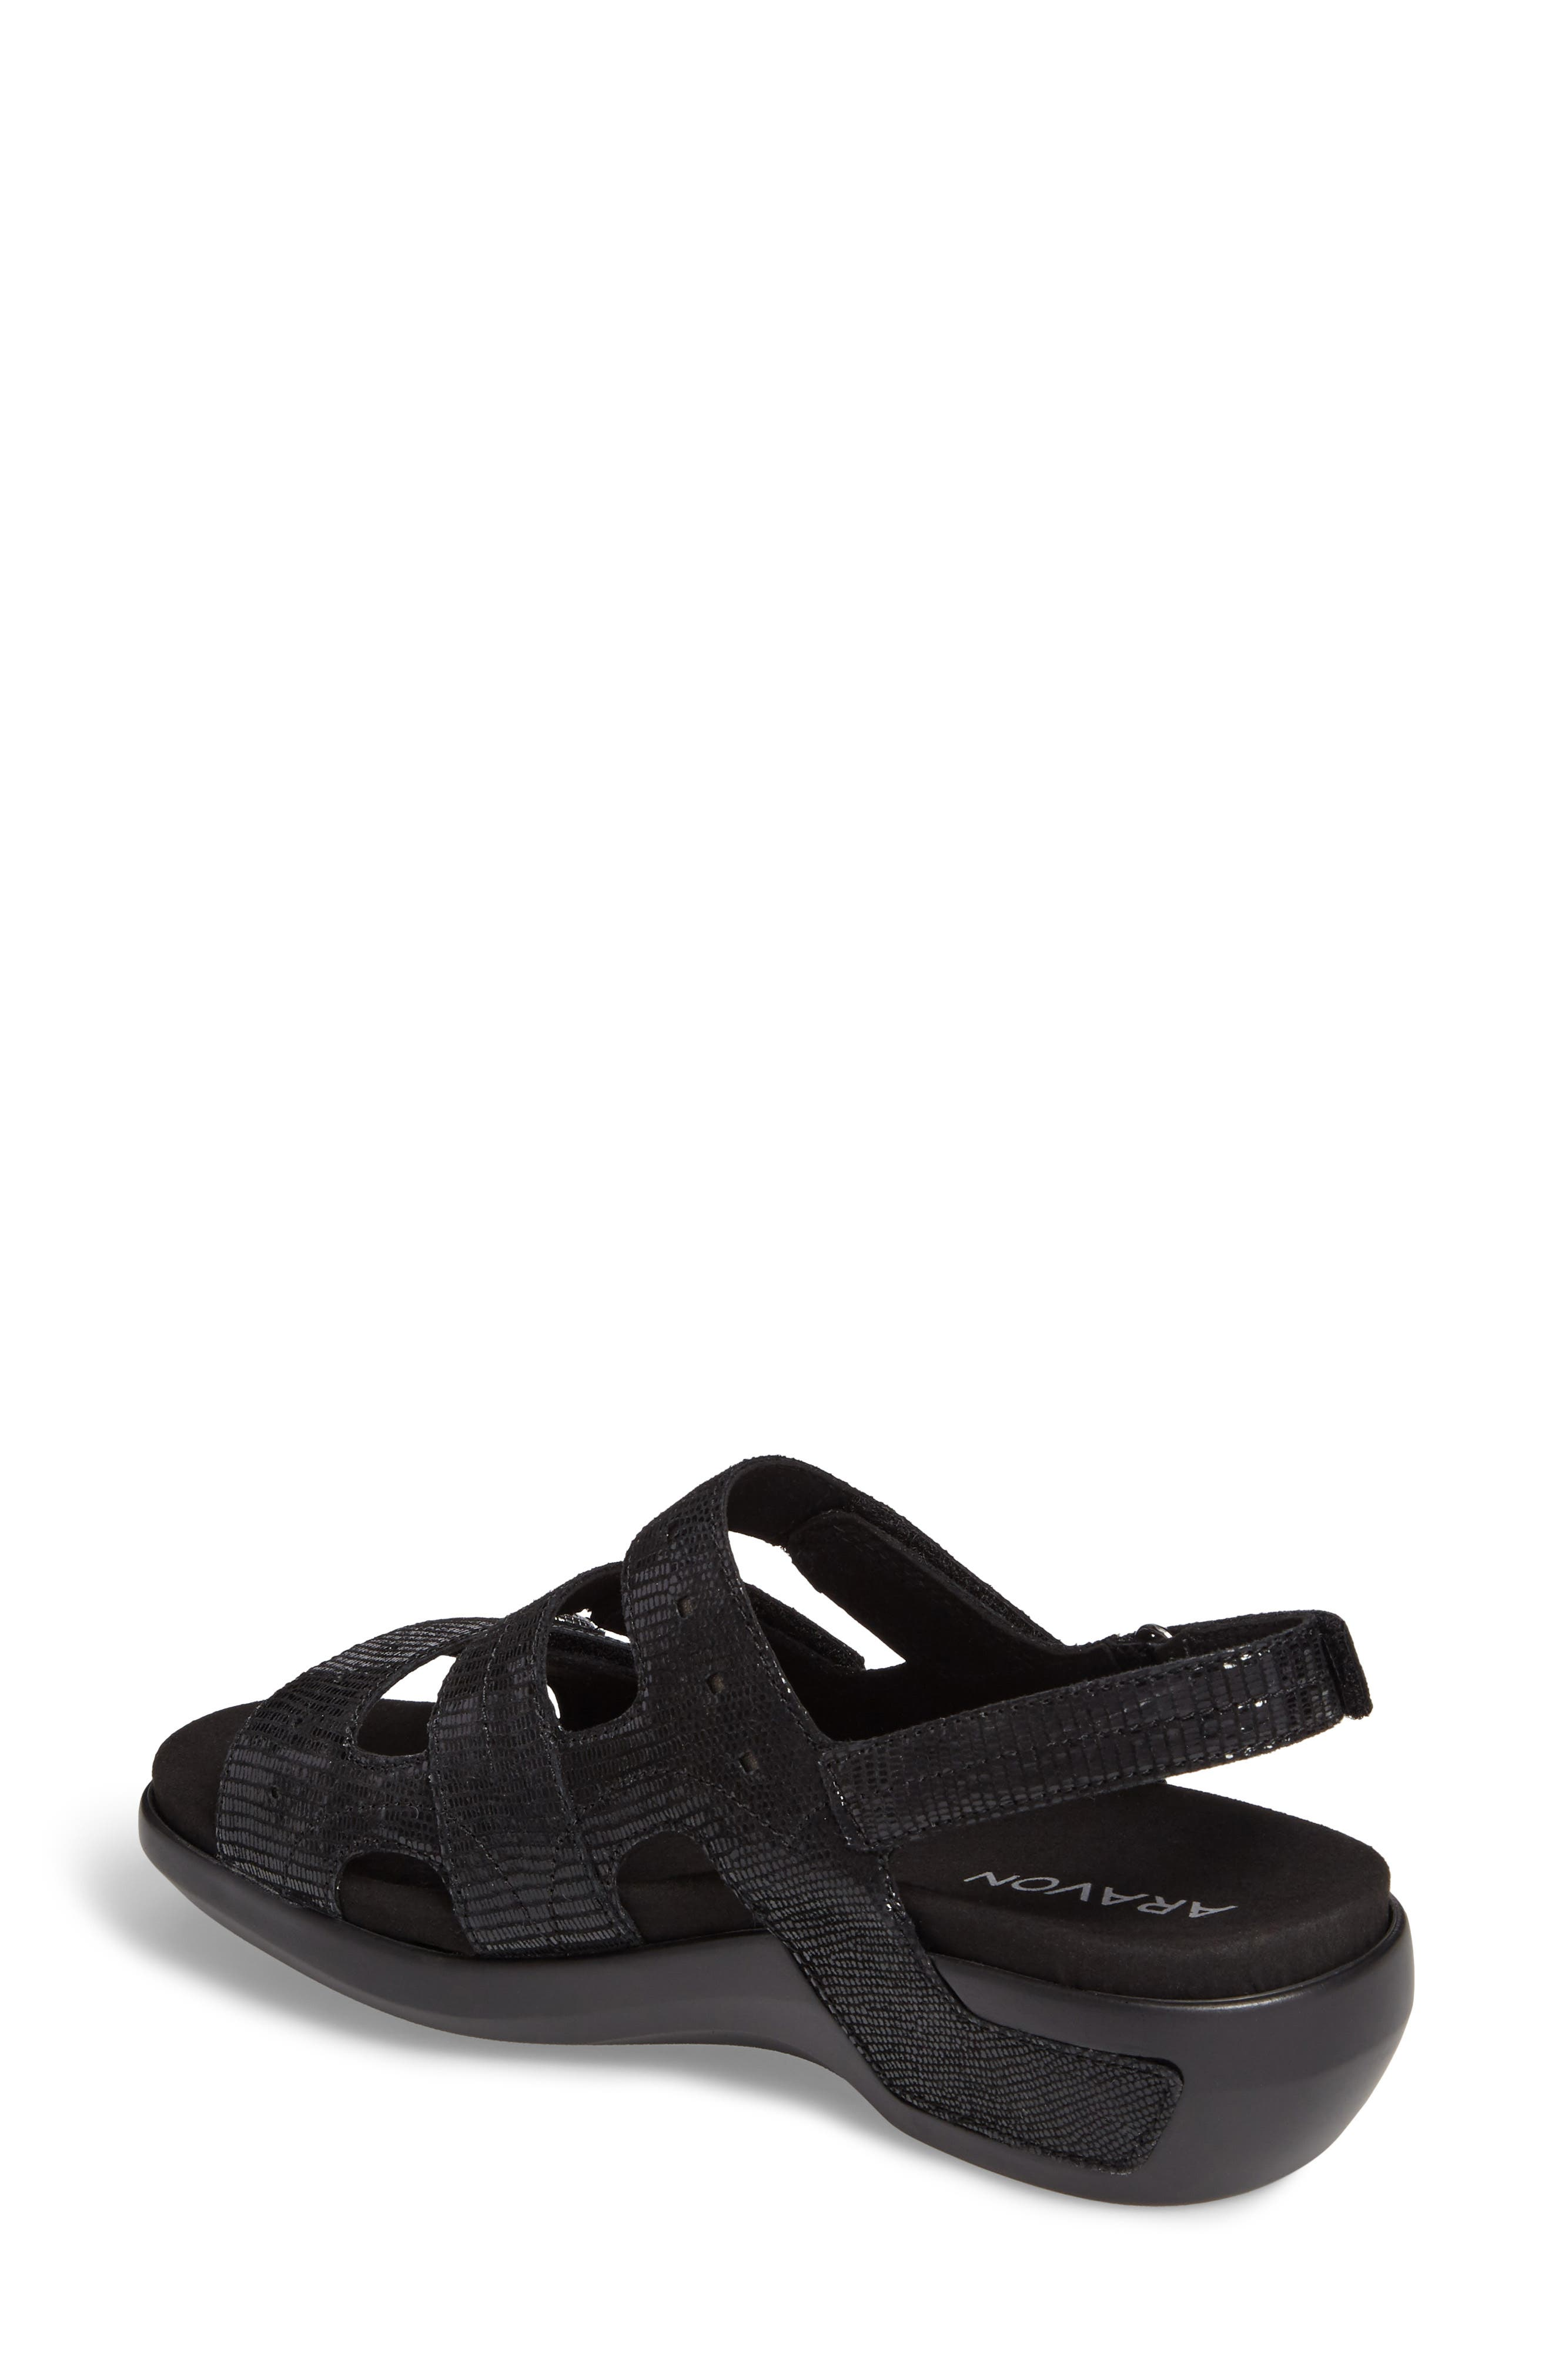 PC Wedge Sandal,                             Alternate thumbnail 2, color,                             BLACK FABRIC